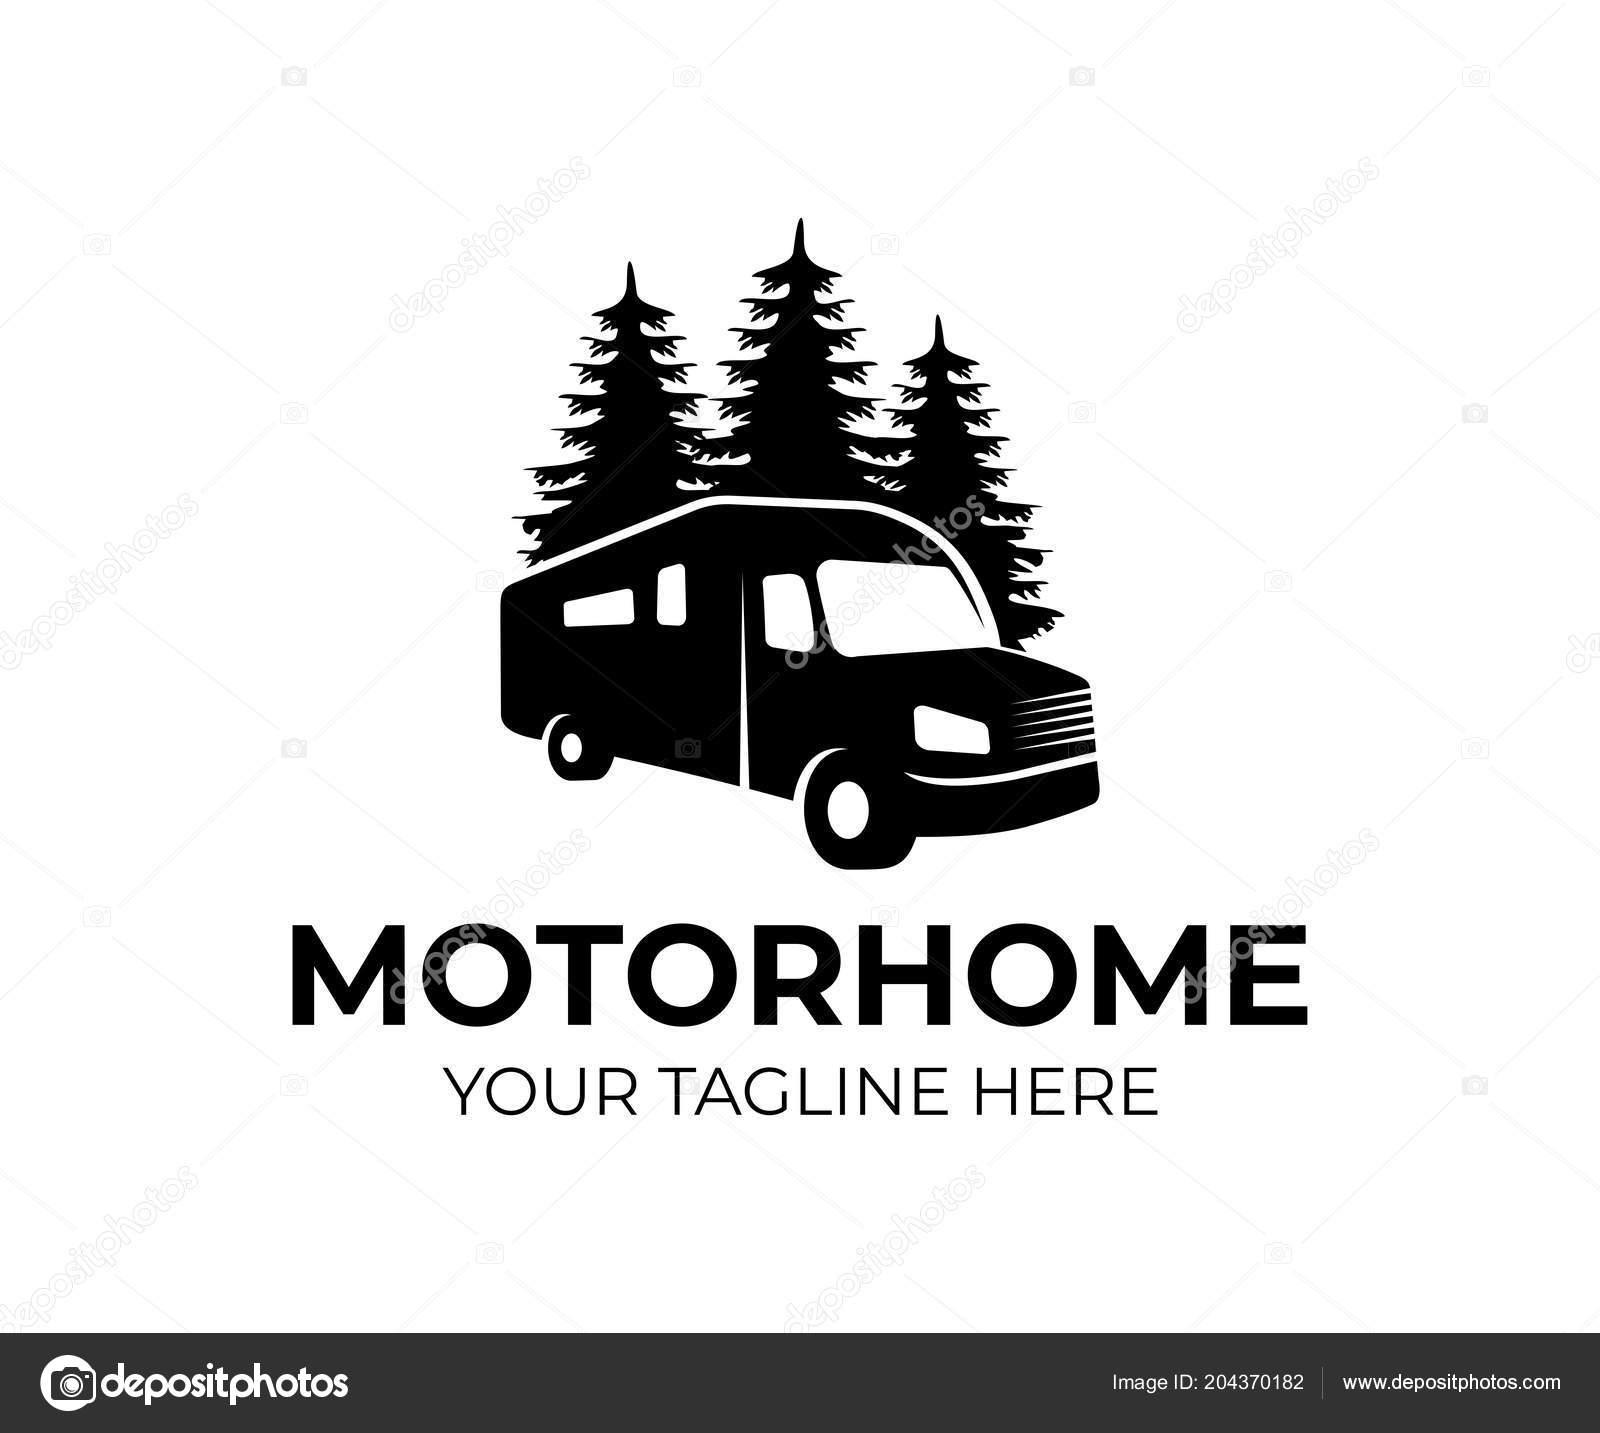 motorhome recreational vehicle camper car logo template vacation